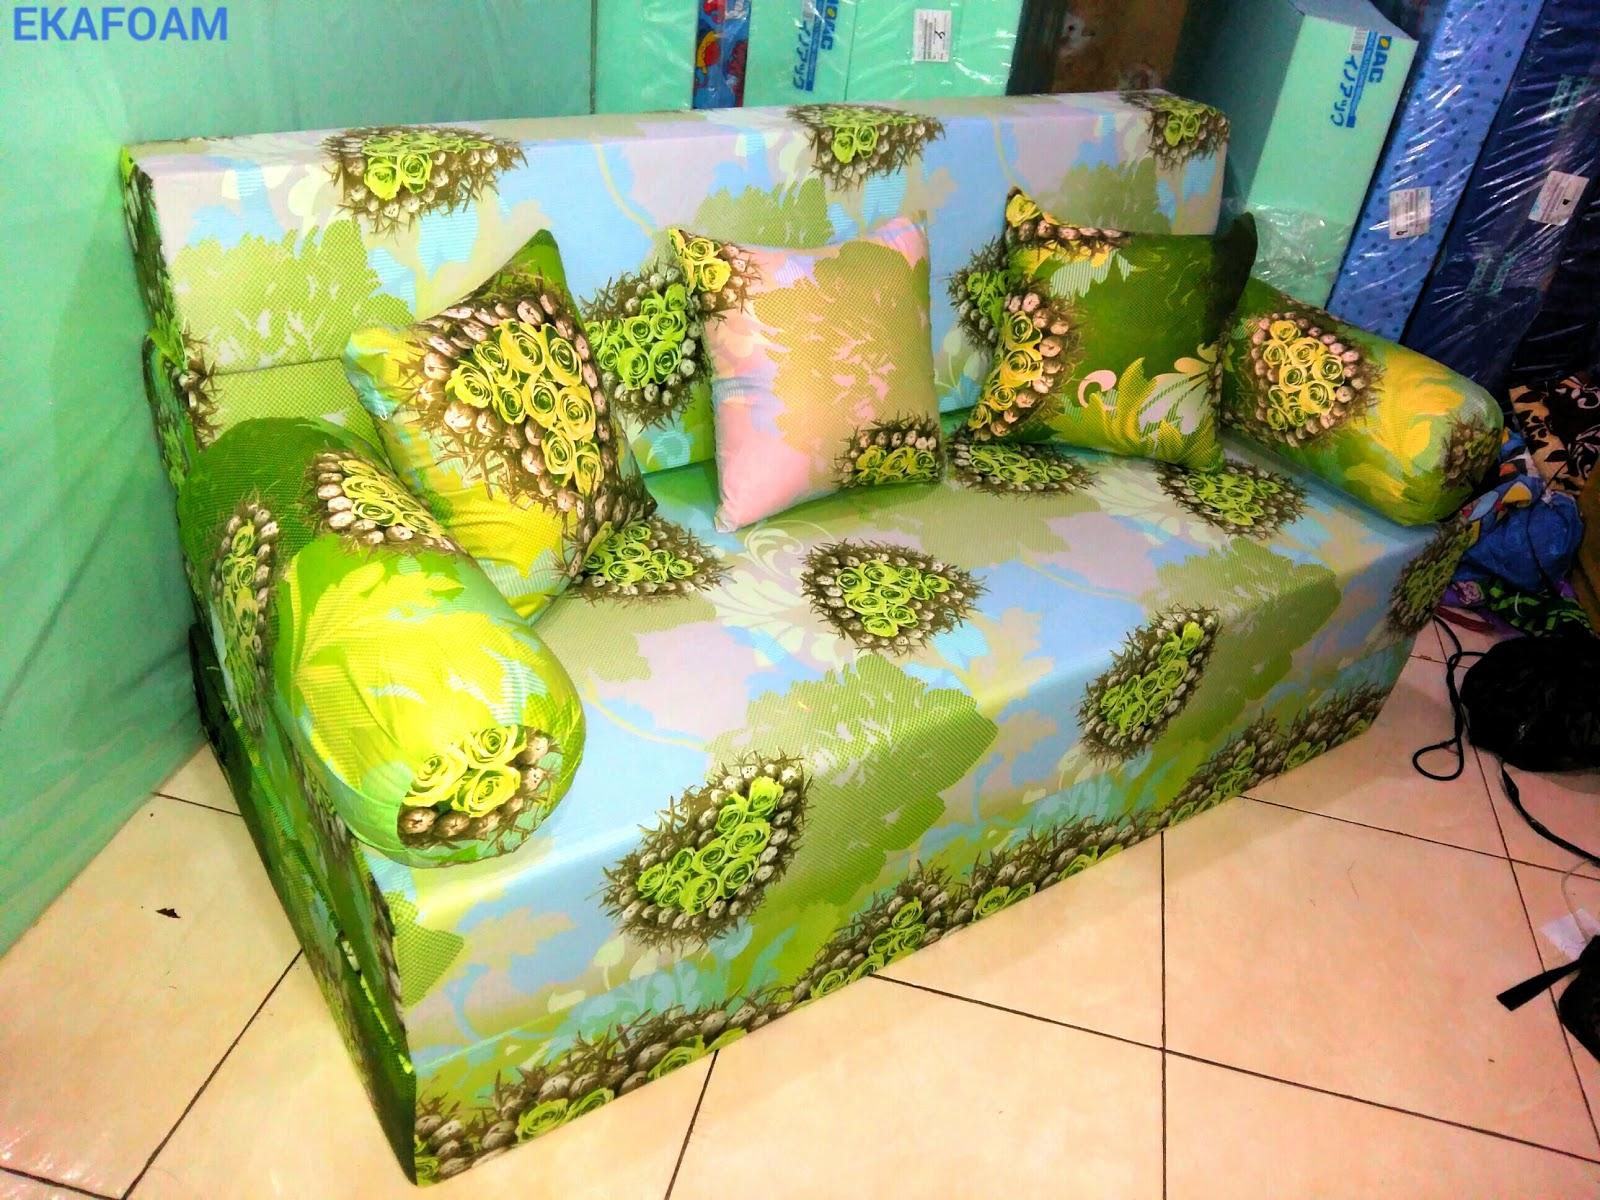 Sofa Bed Kasur Busa Lipat Inoac Jakarta Steel Table Legs Motif Anggur Ijo Agen